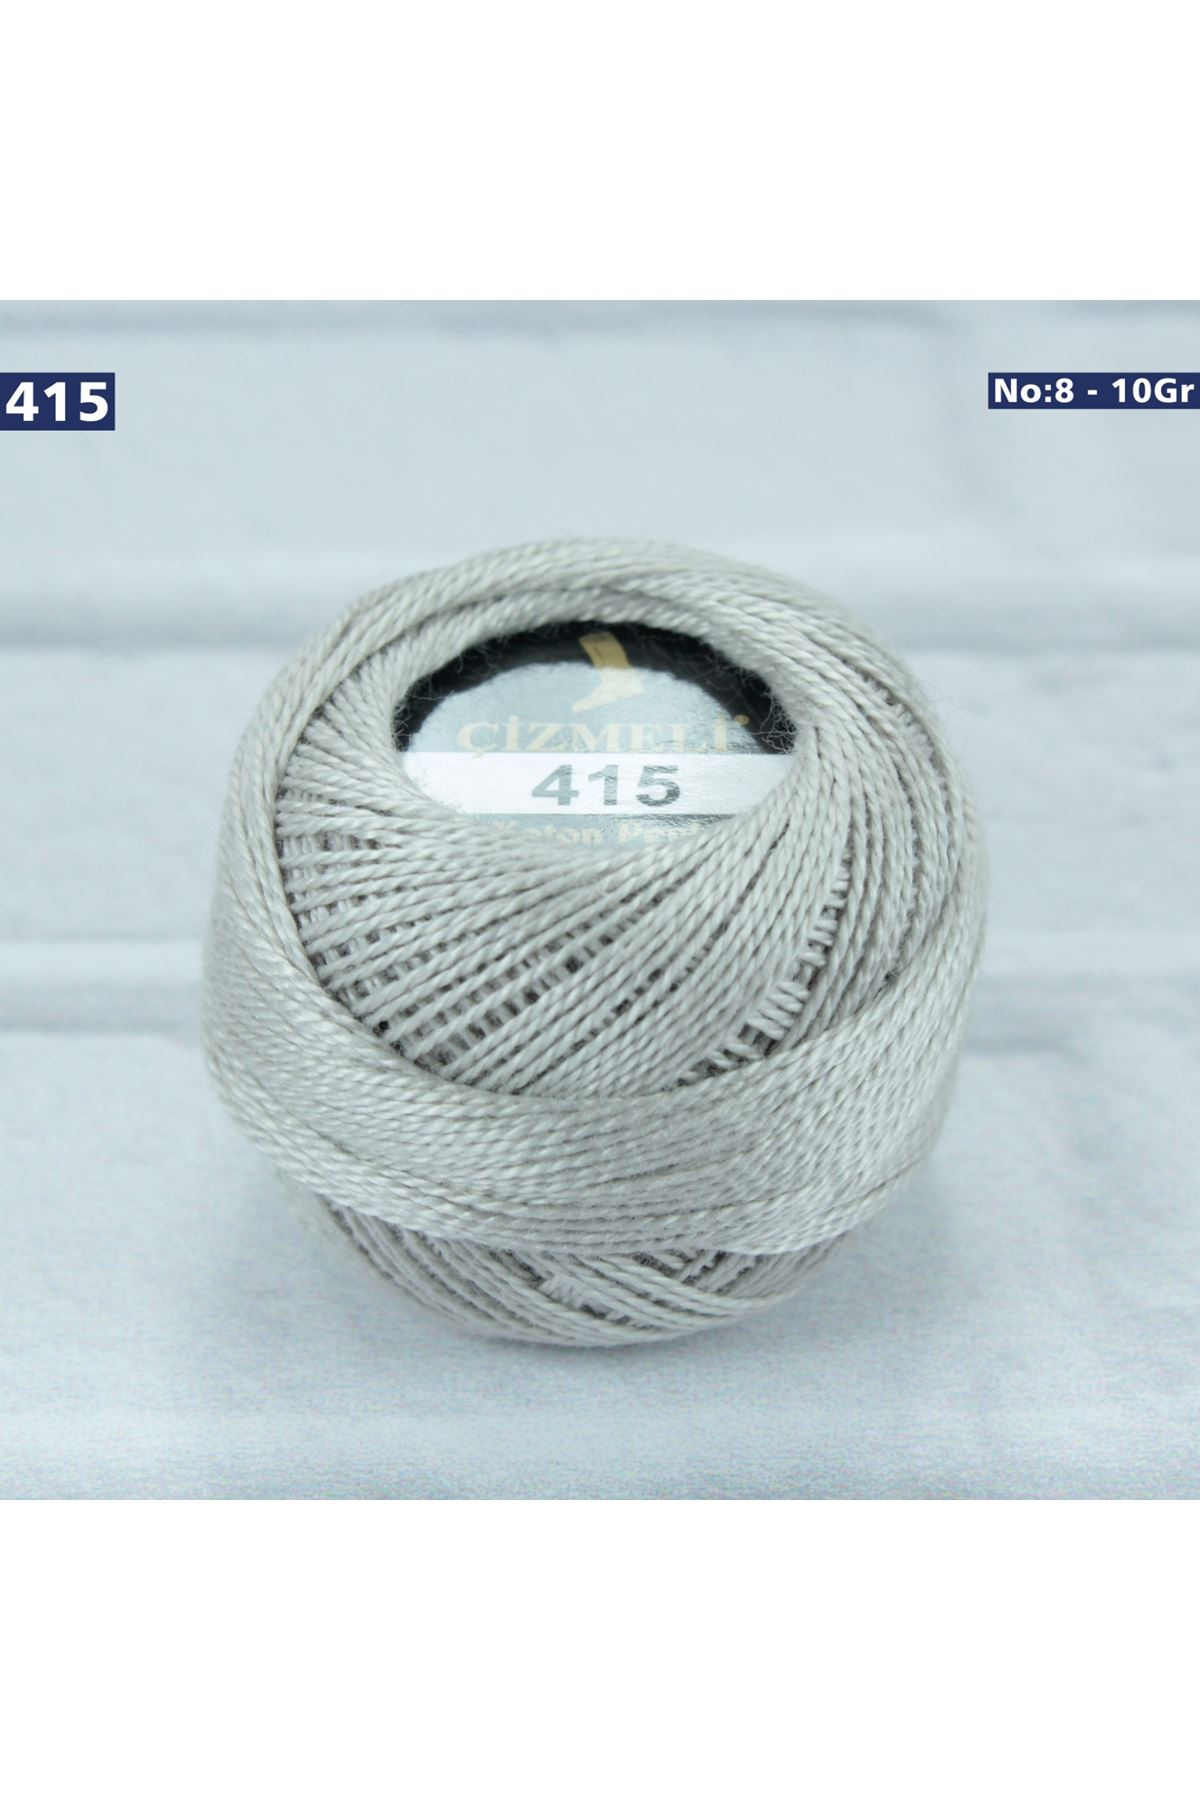 Çizmeli Cotton Perle Nakış İpliği No: 415